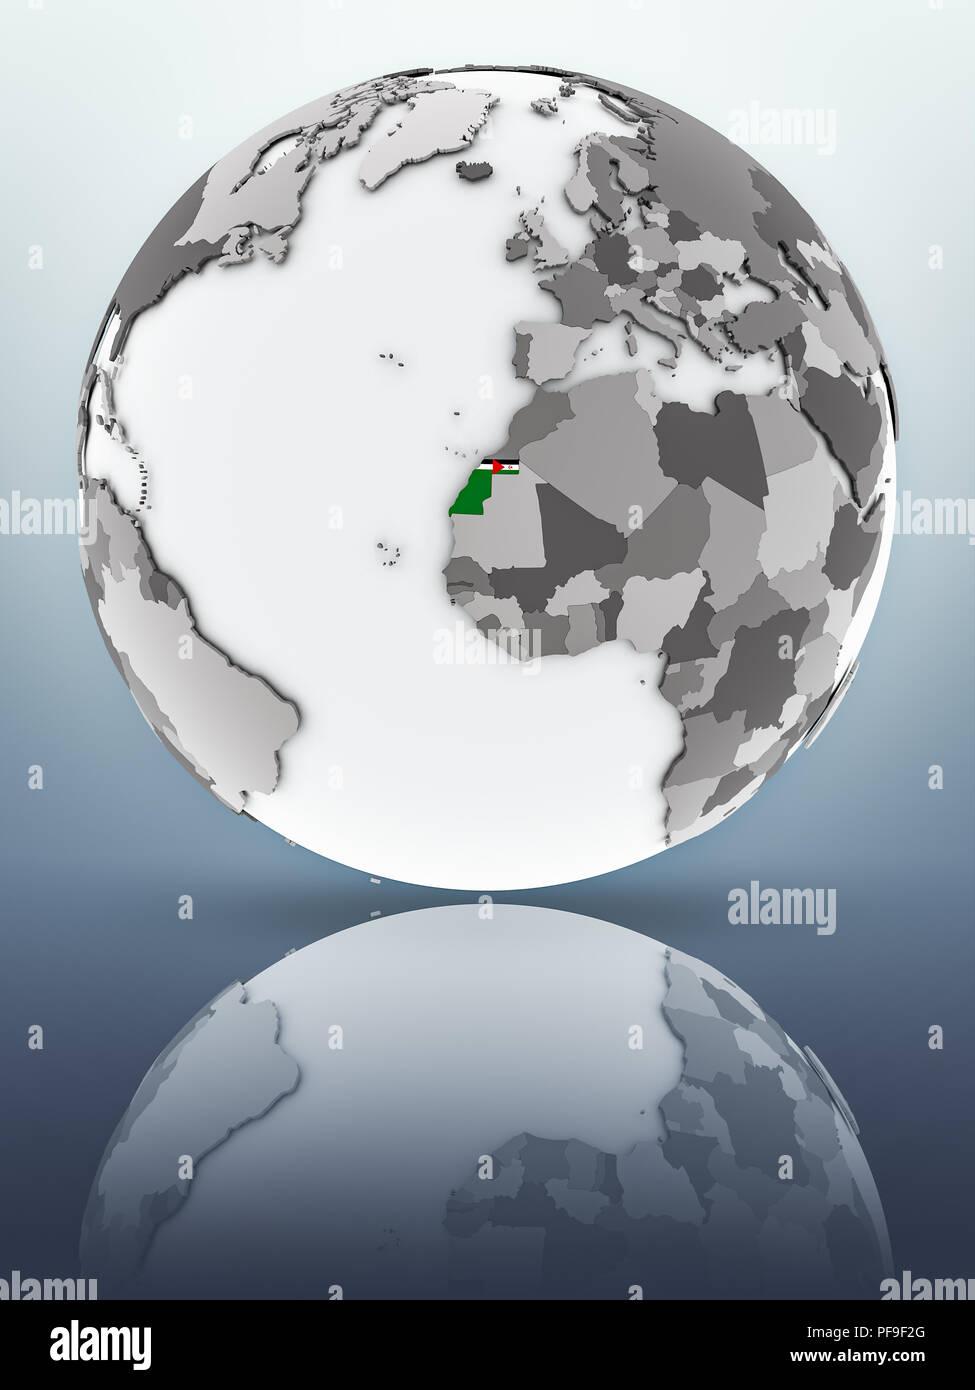 Western Sahara with flag on globe reflecting on surface. 3D illustration. Stock Photo